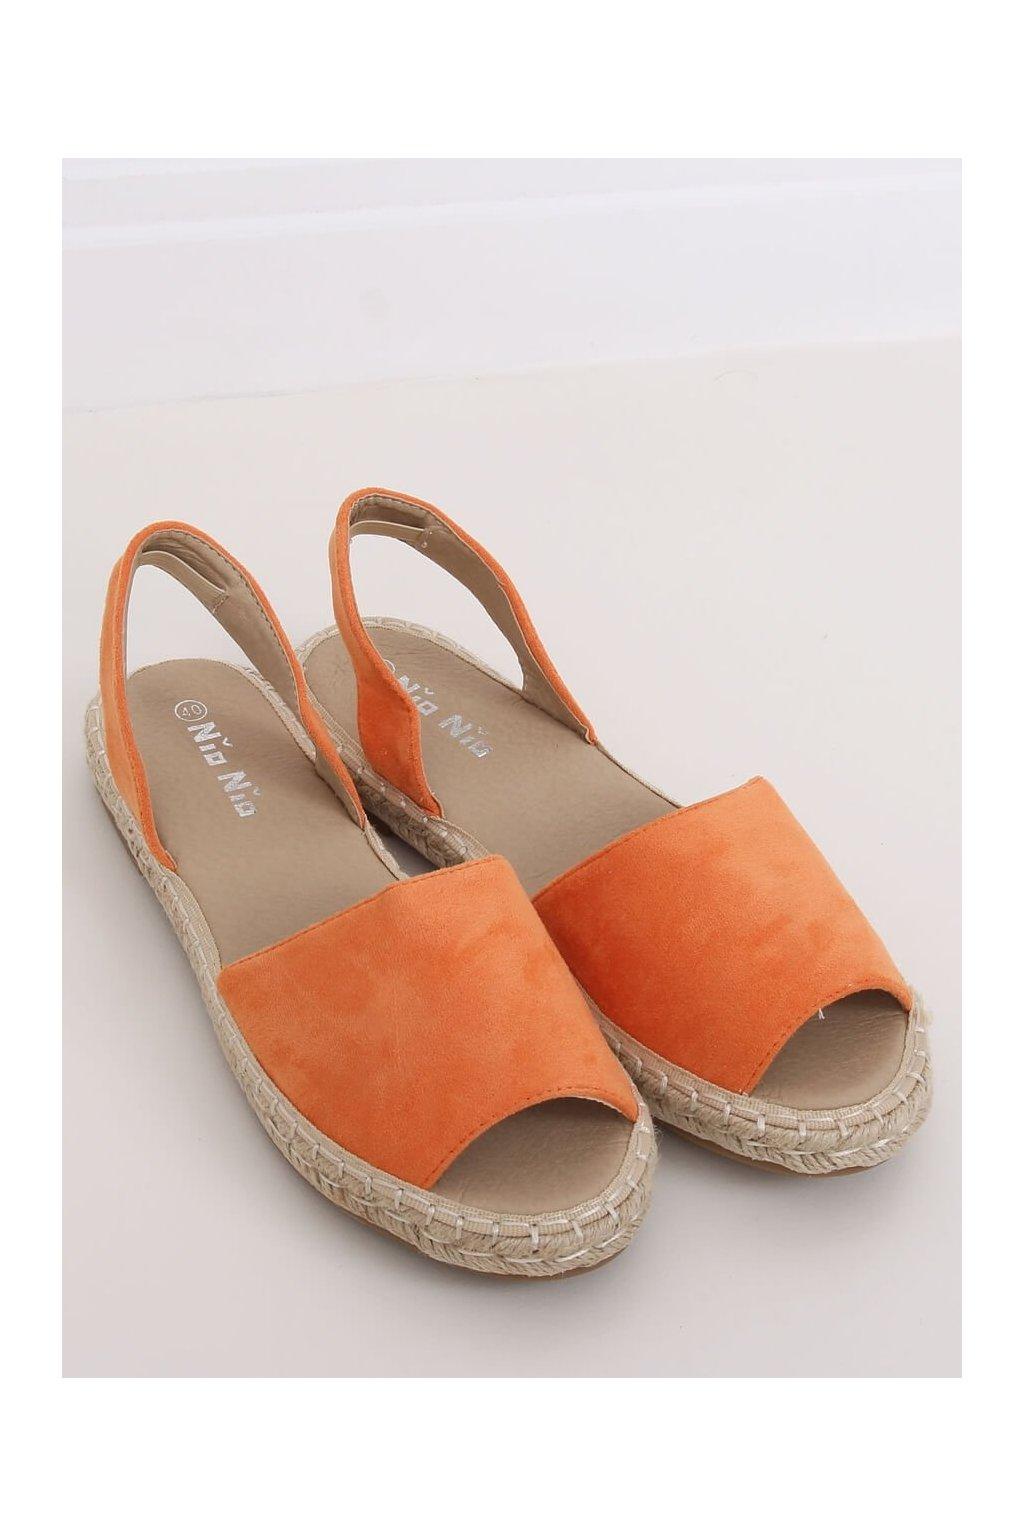 Oranžové sandále NJSK 99-26A